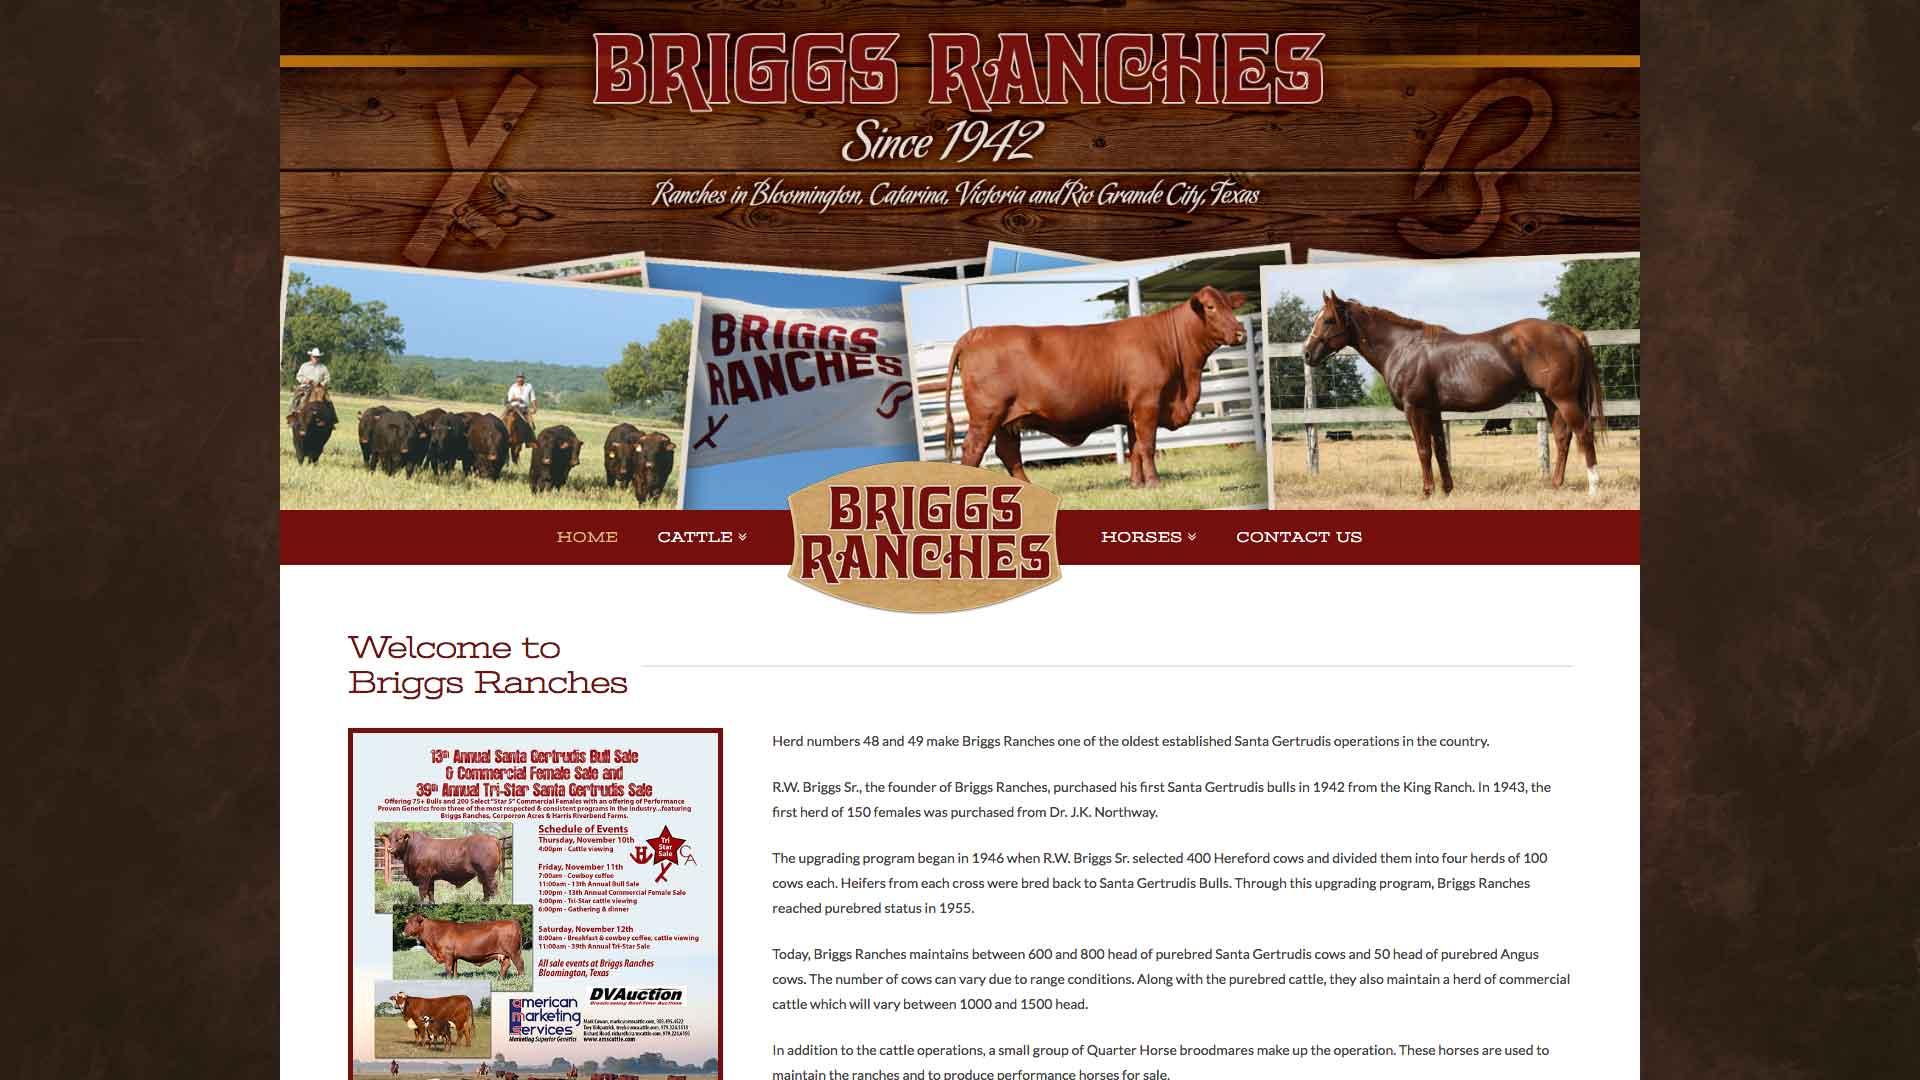 New website briggs ranch ranch house designs inc for Ranch house designs inc